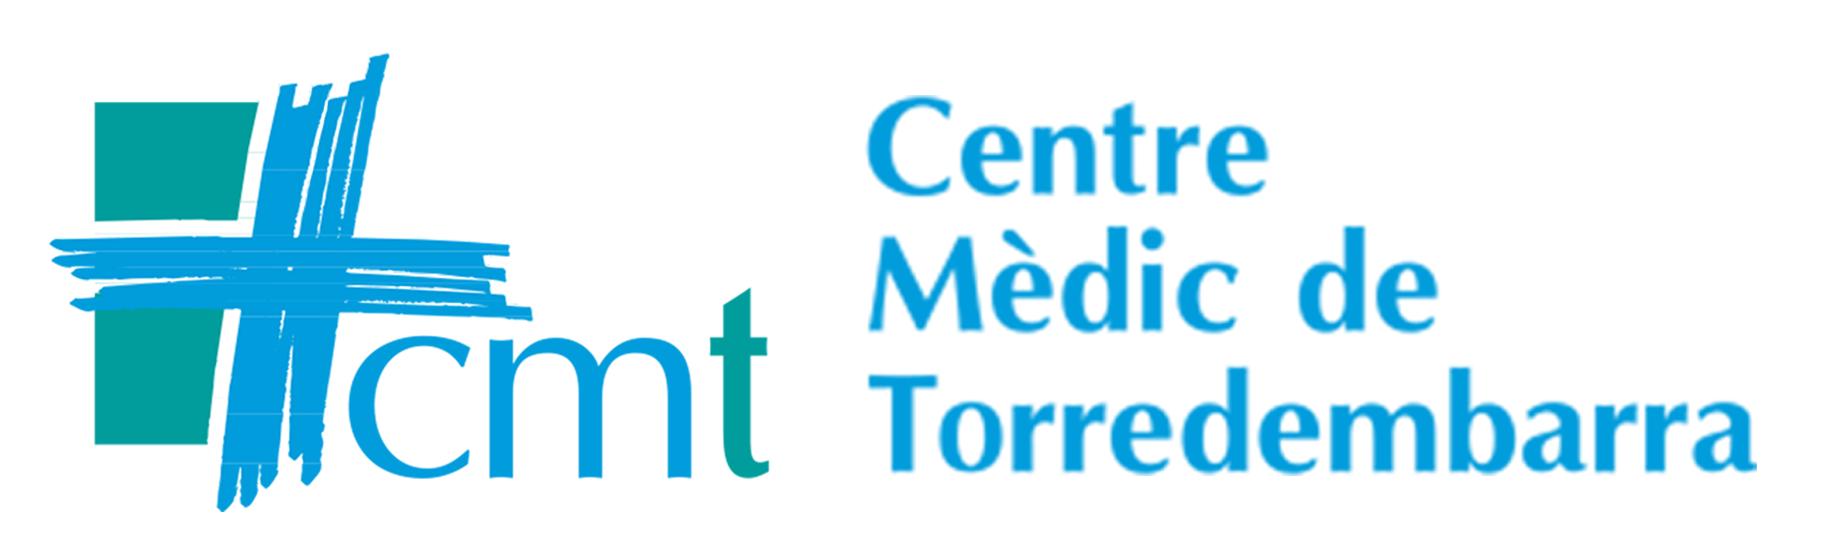 Centre Mèdic Torredembarra